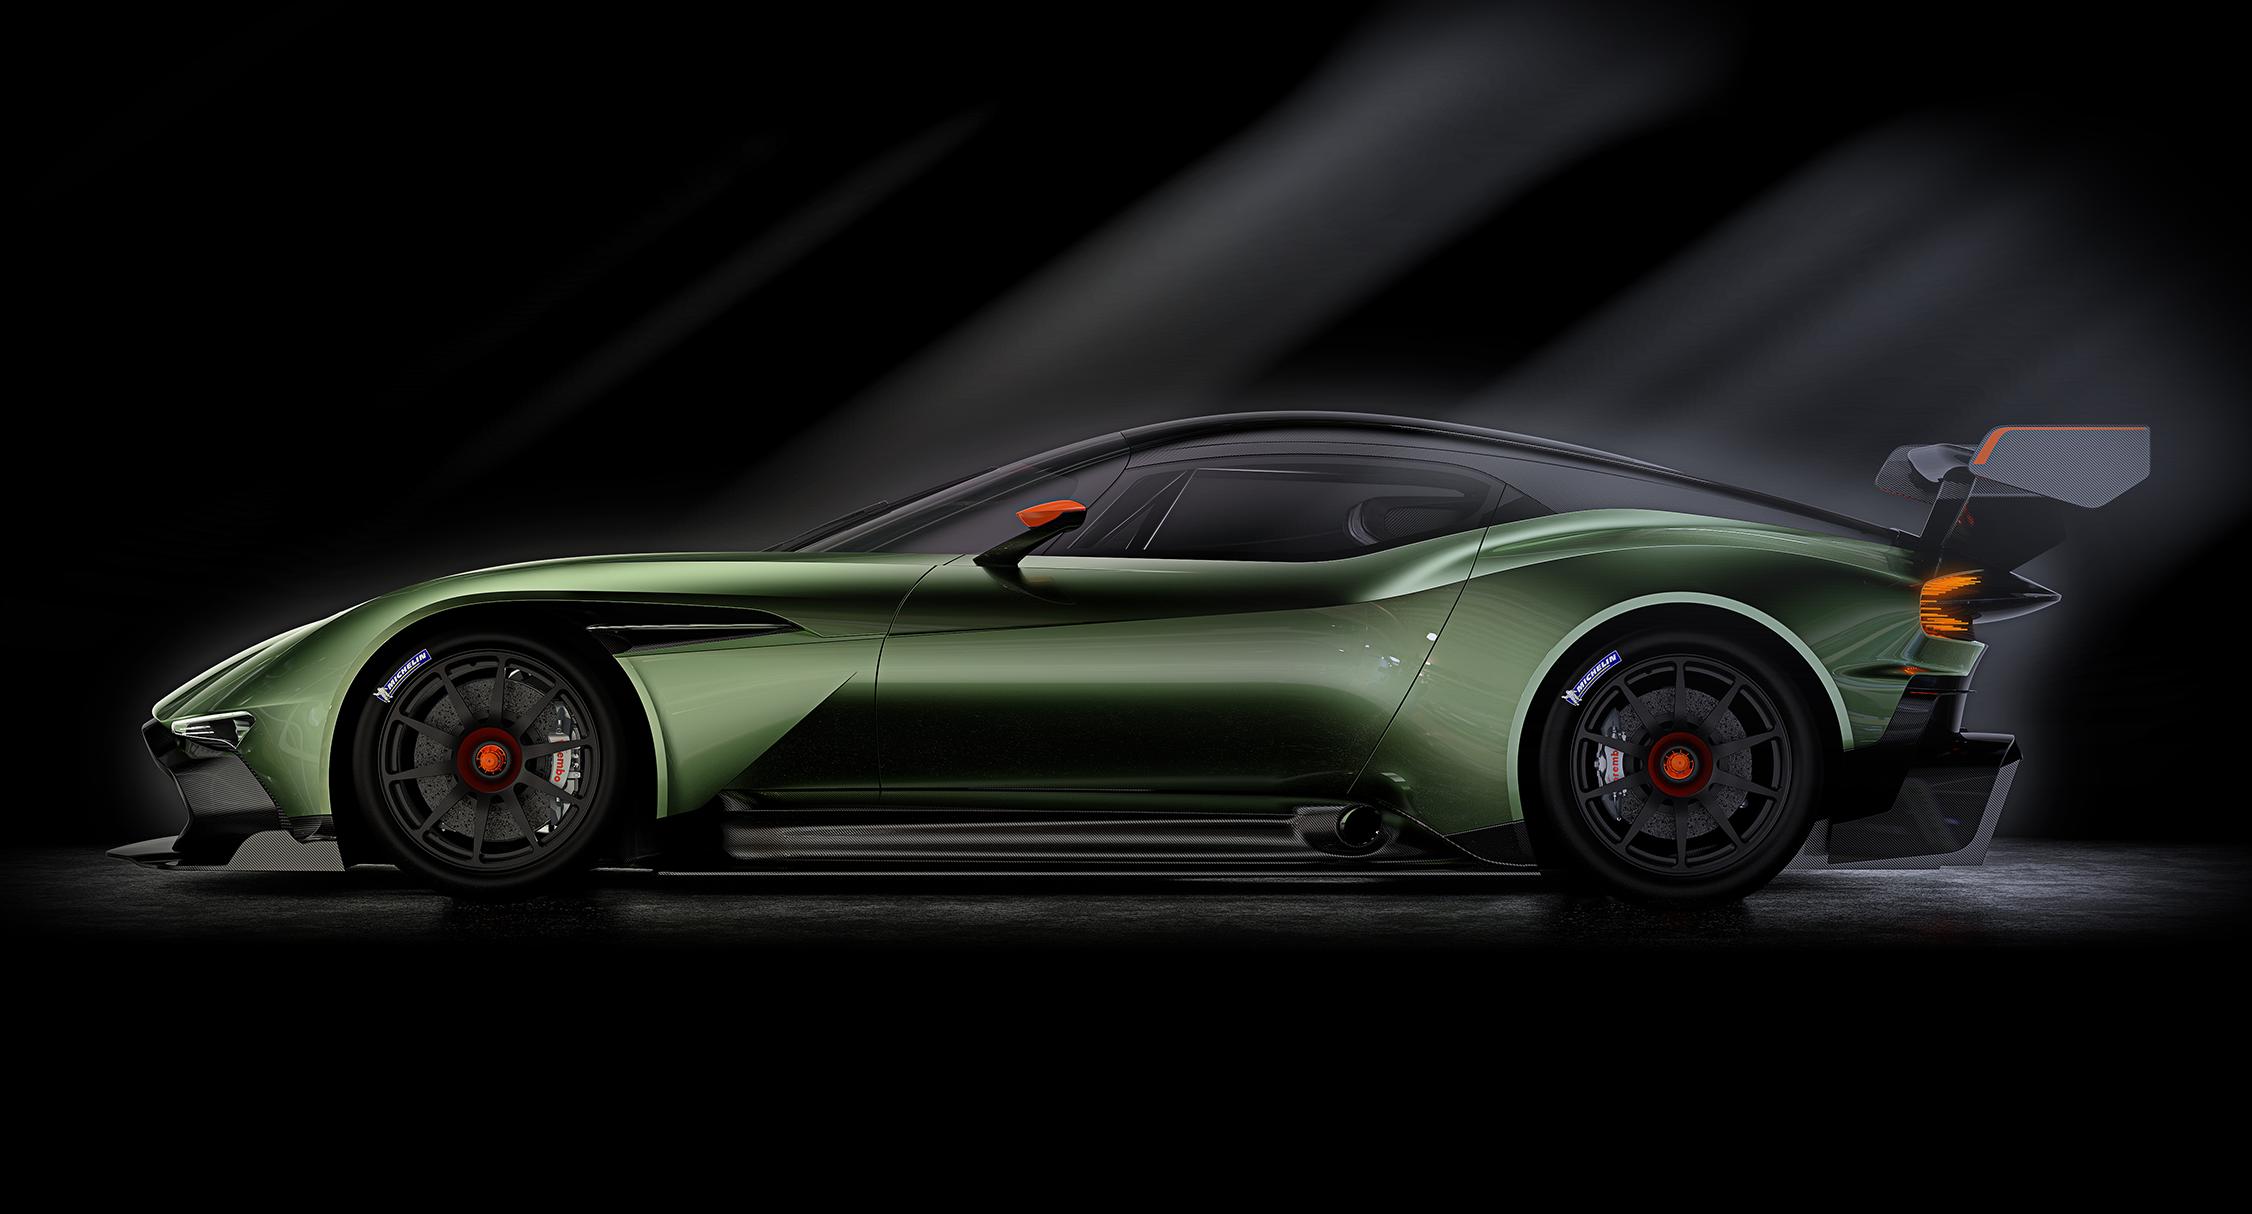 Aston Martin Vulcan Aston Martin Pressroom